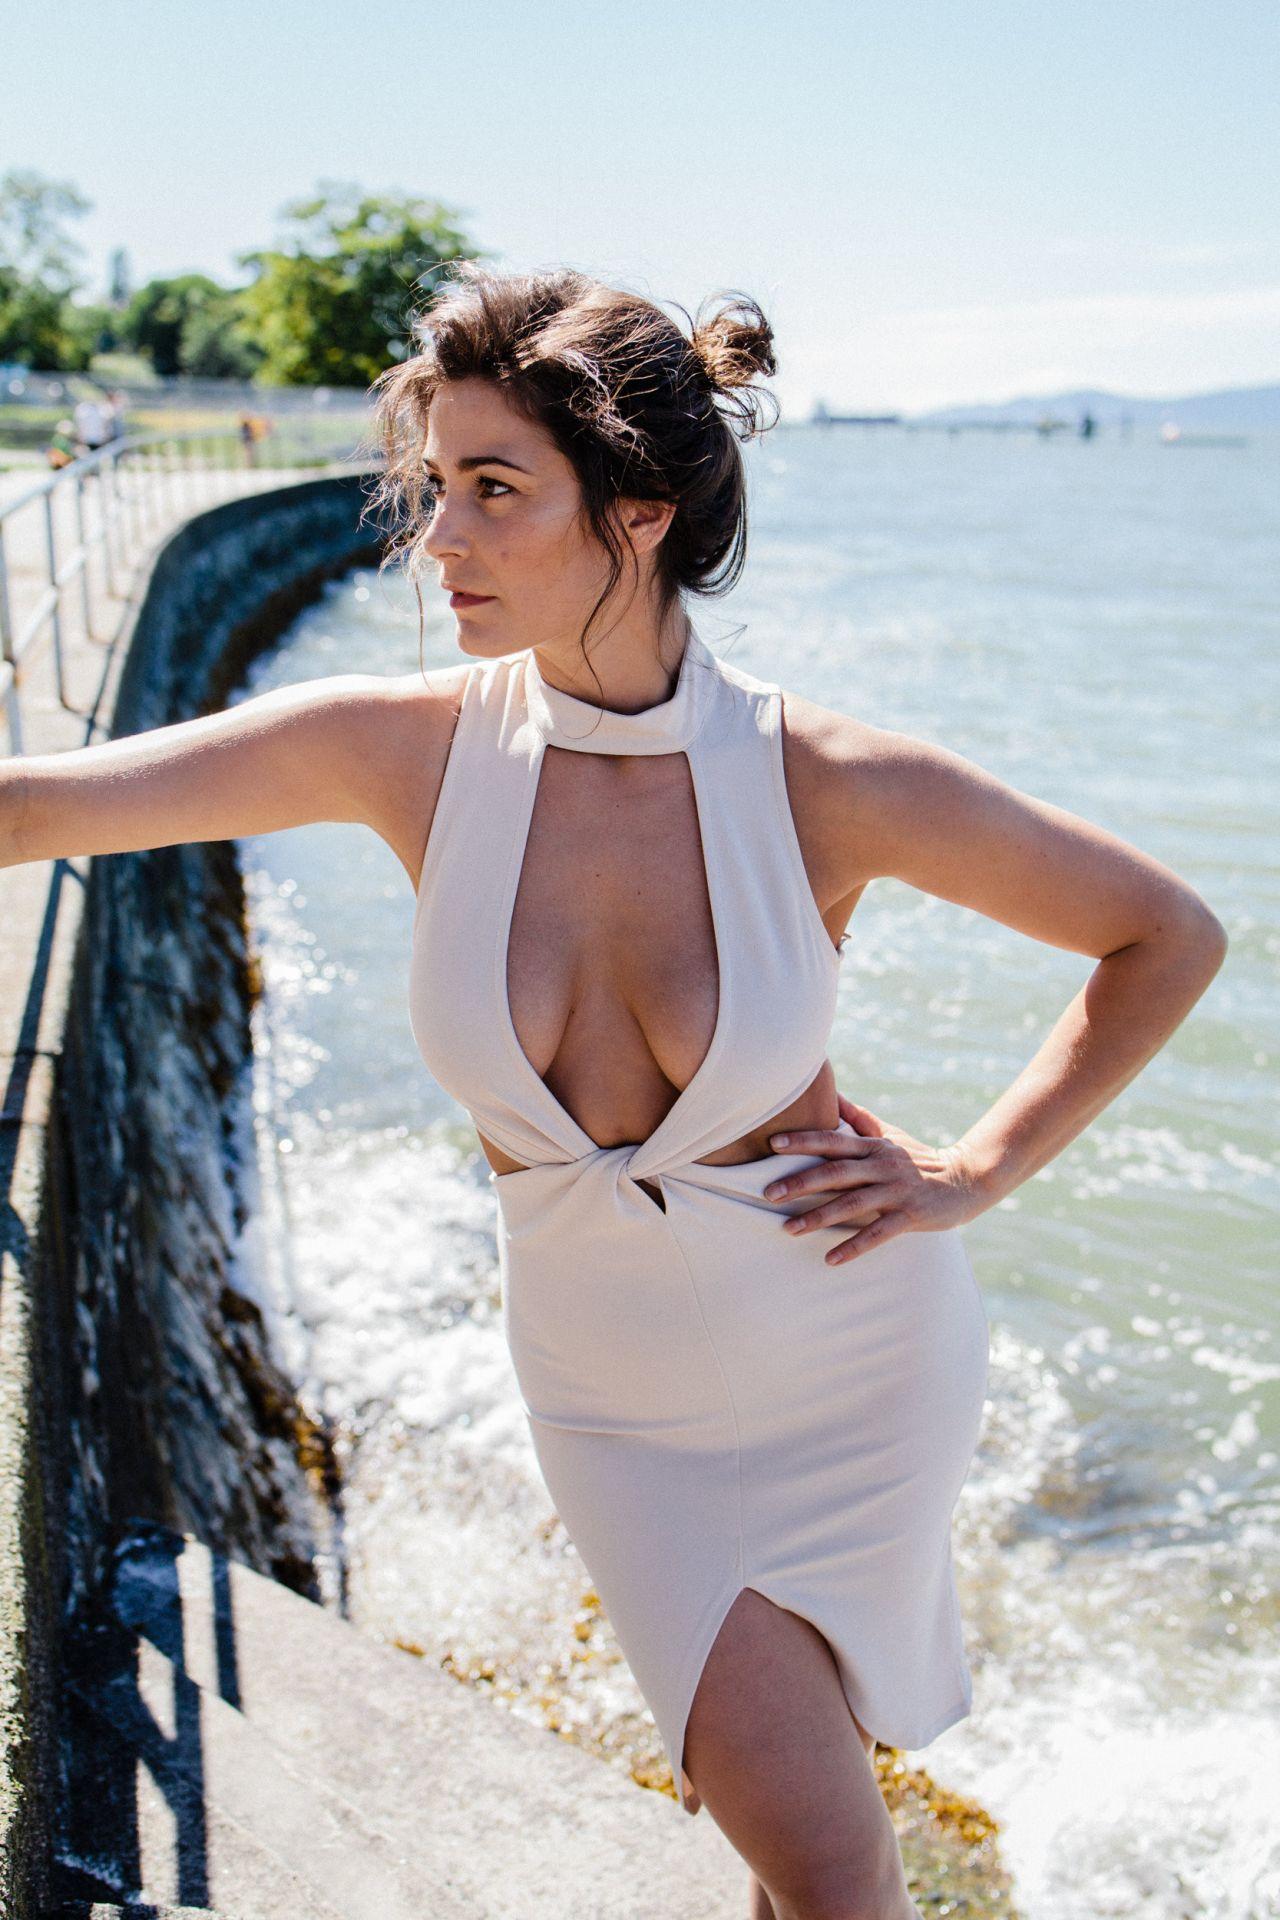 Paparazzi Elysia Rotaru nude photos 2019